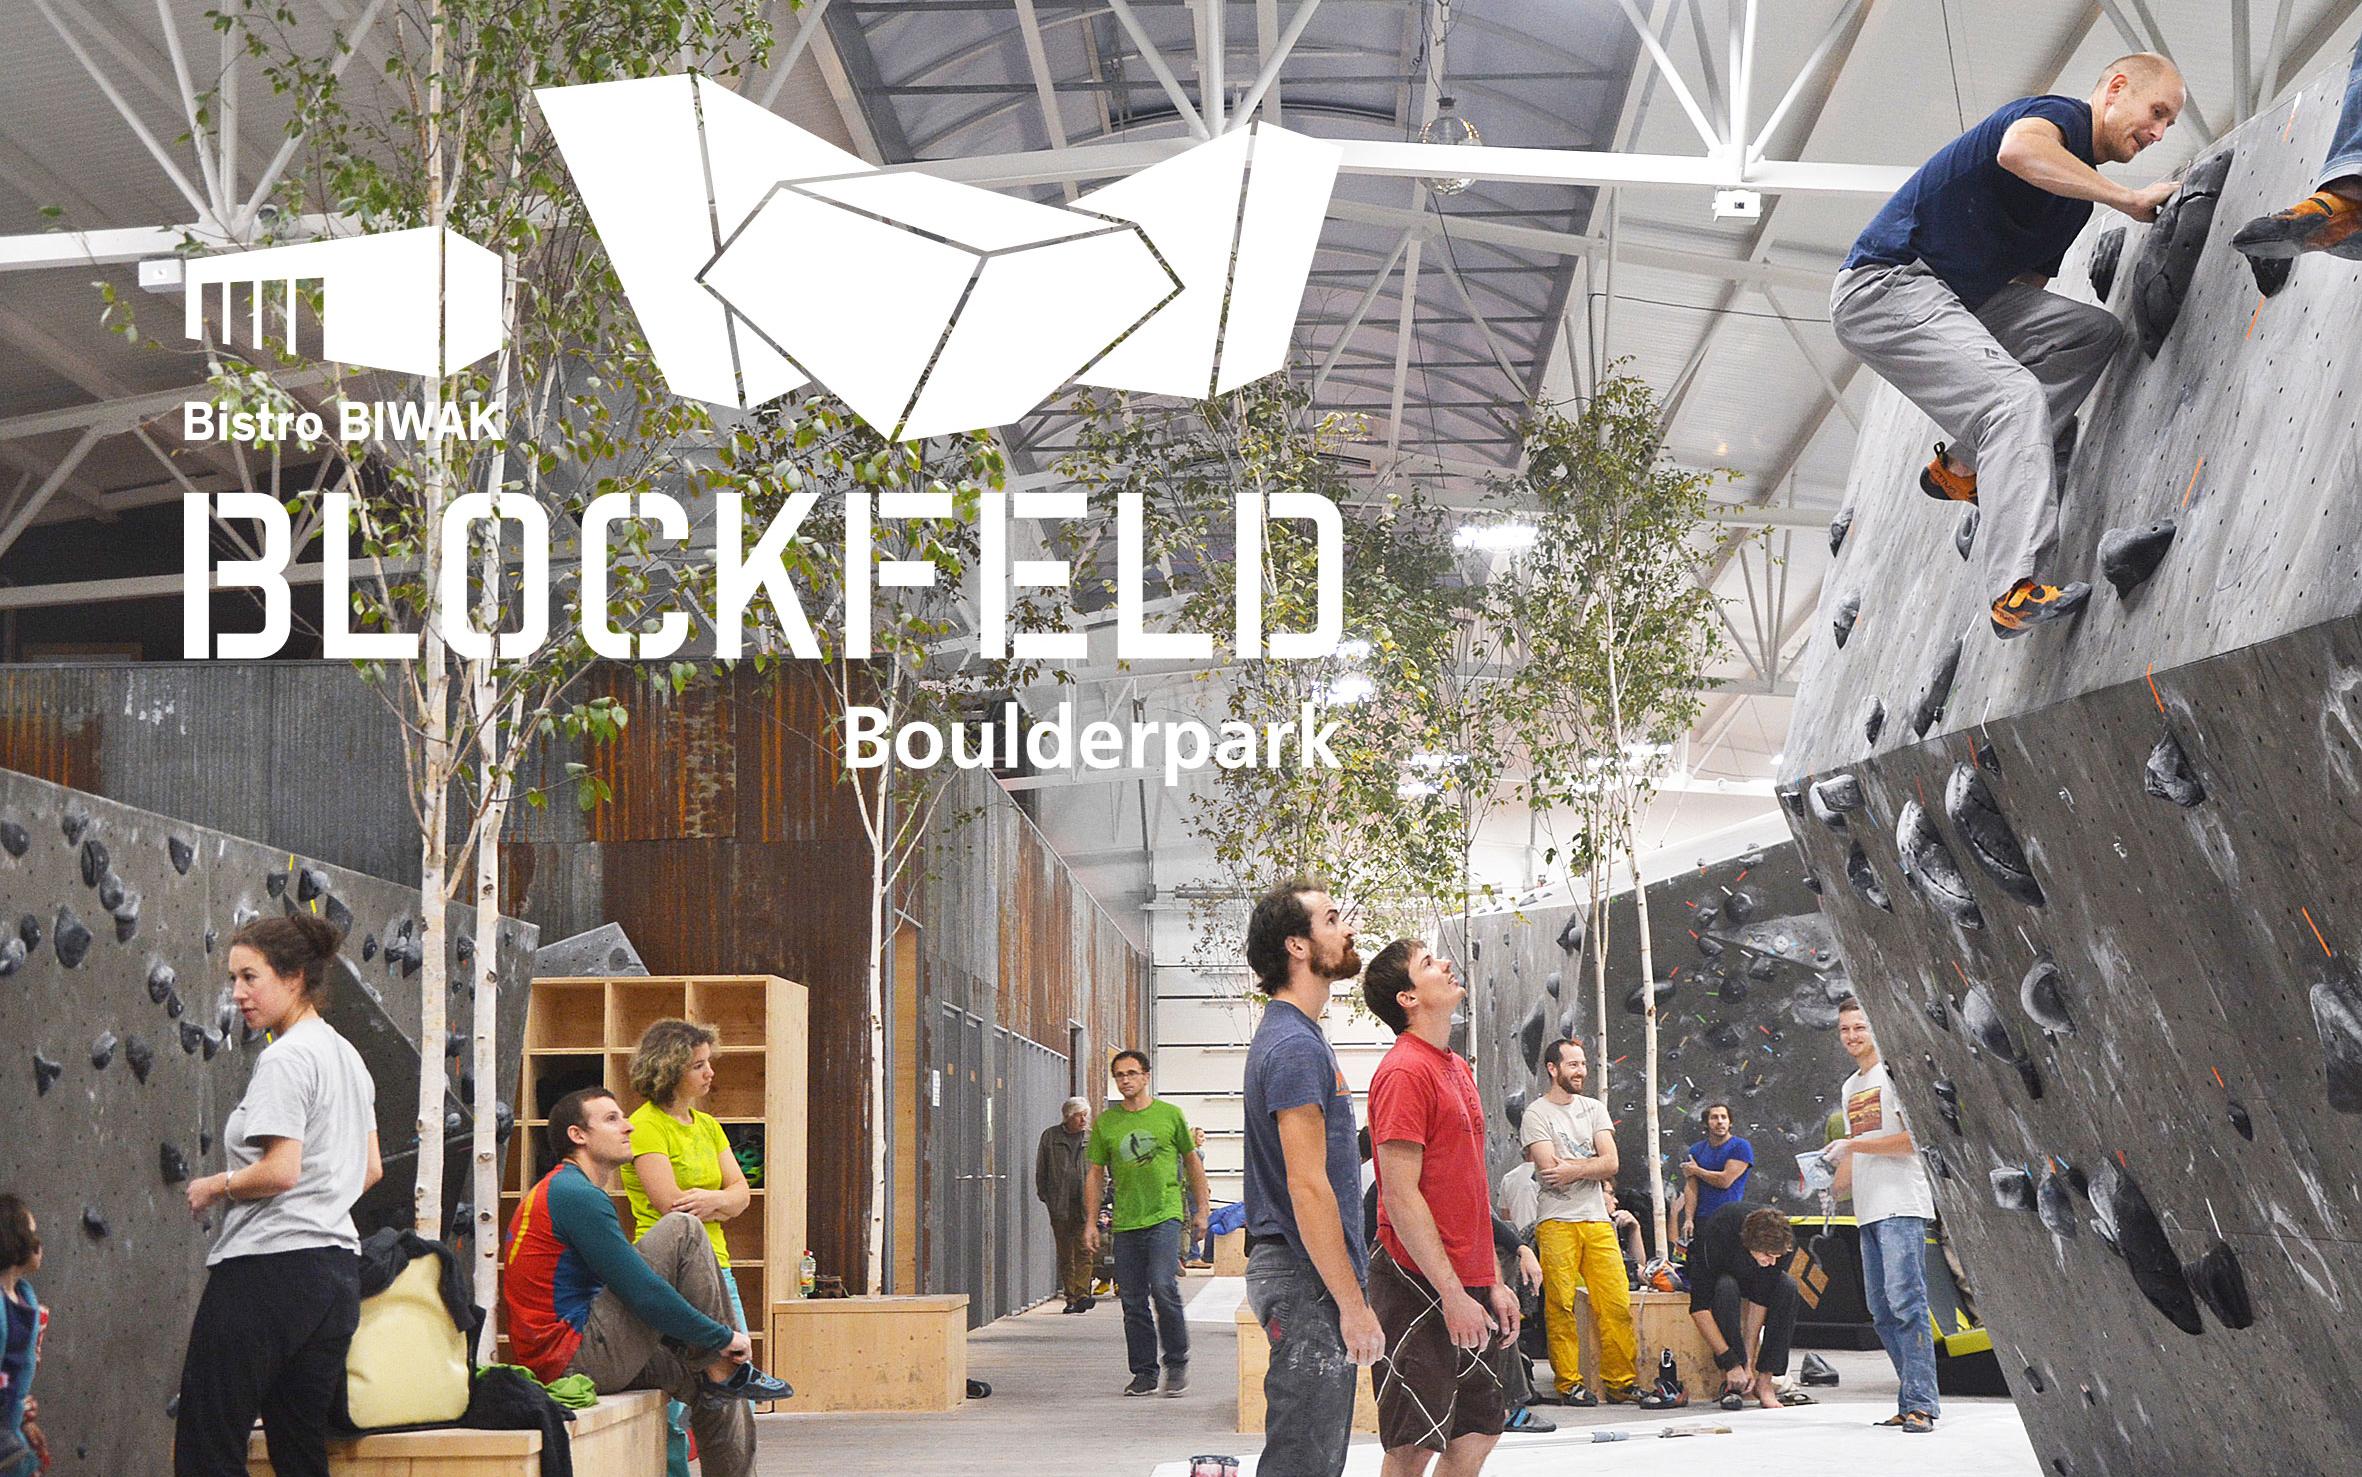 Blockfeld Boulderhalle Winterthur